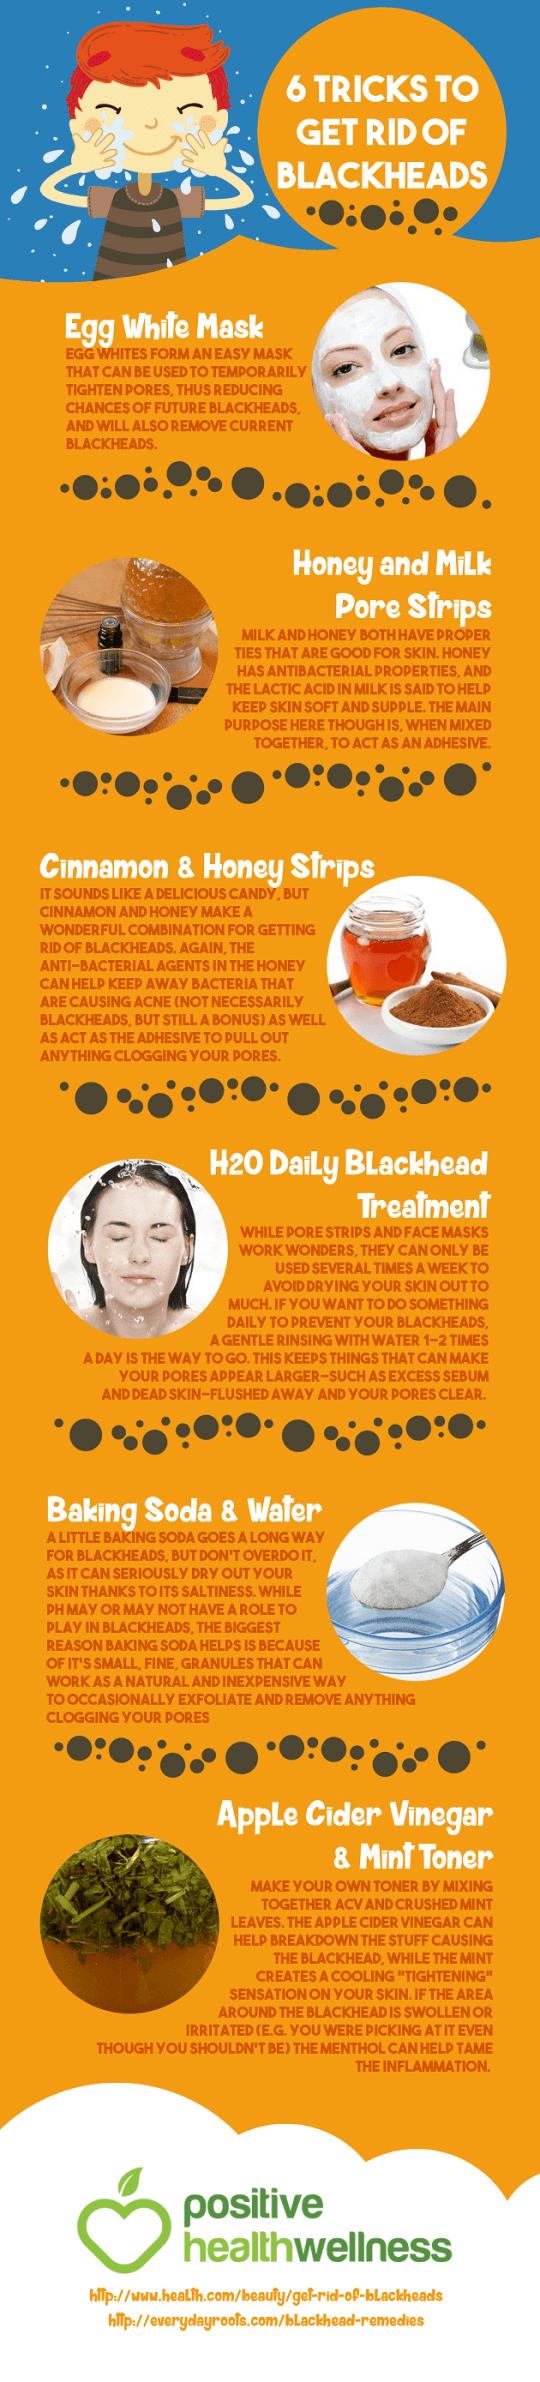 6 Tricks to Get Rid of Blackheads